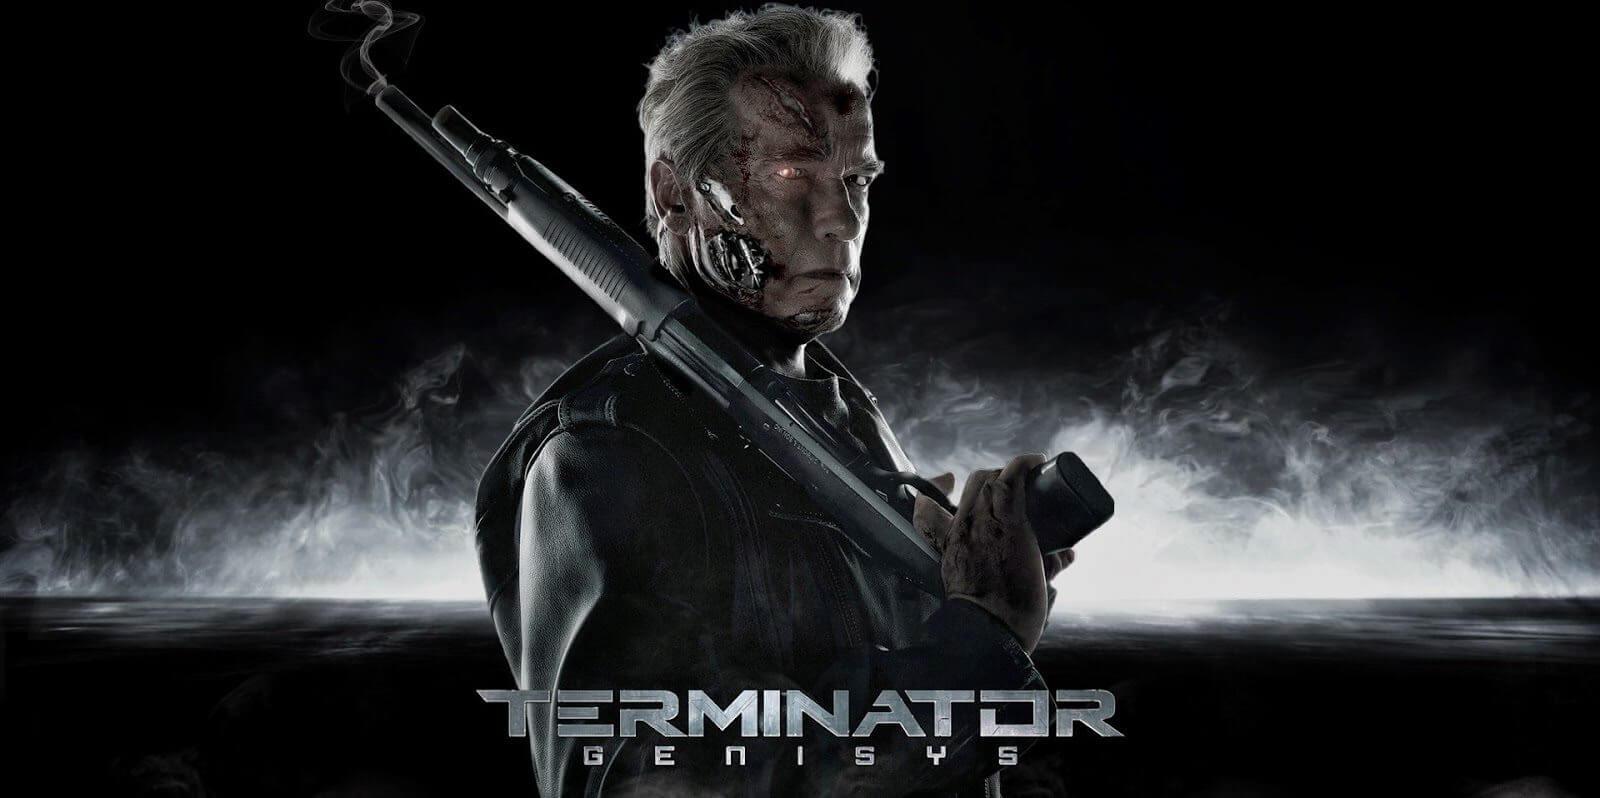 oexterminator genisys movie wal 2